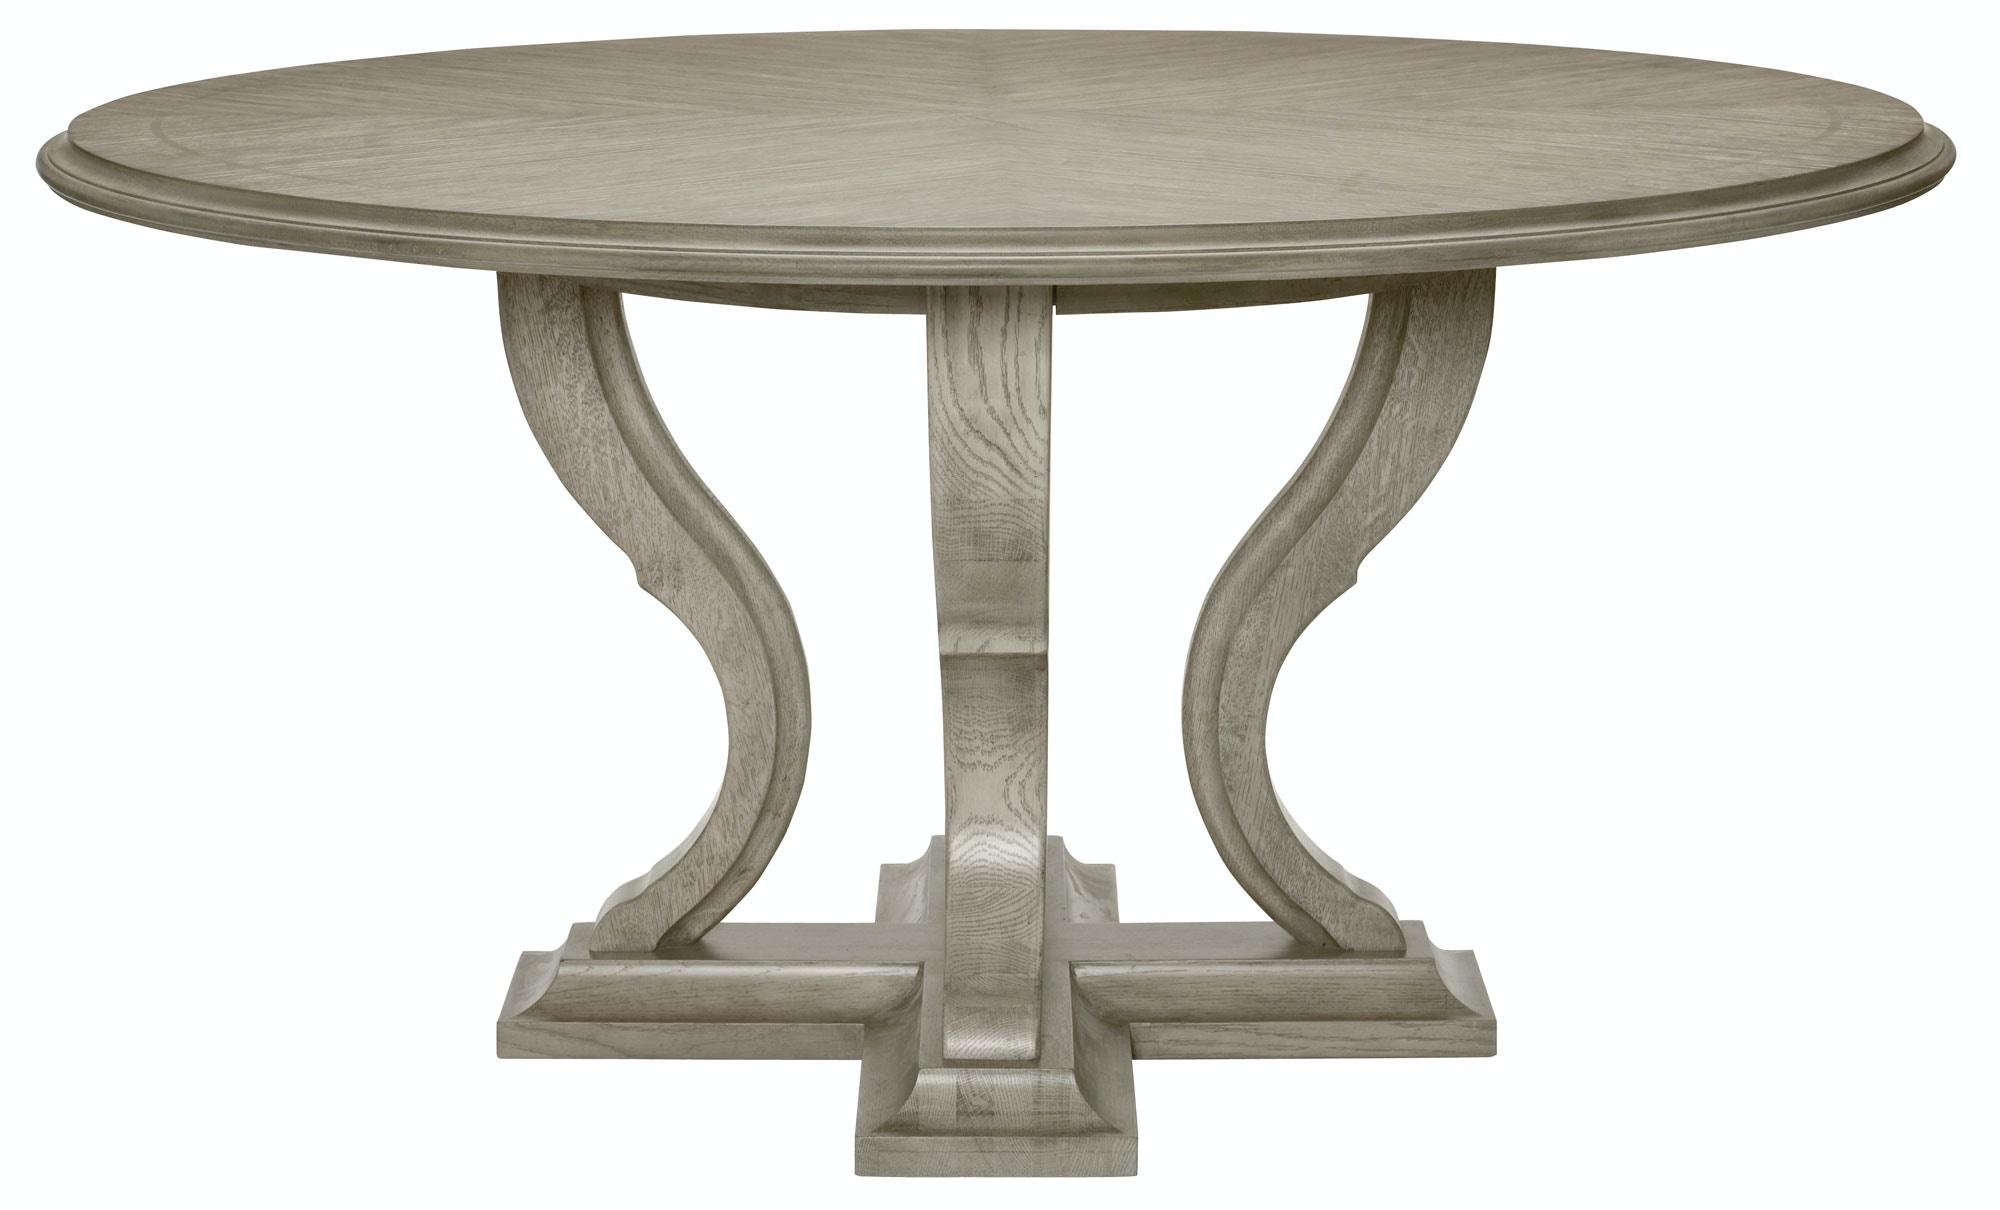 Bernhardt Furniture Marquesa Round Dining Table 359 274